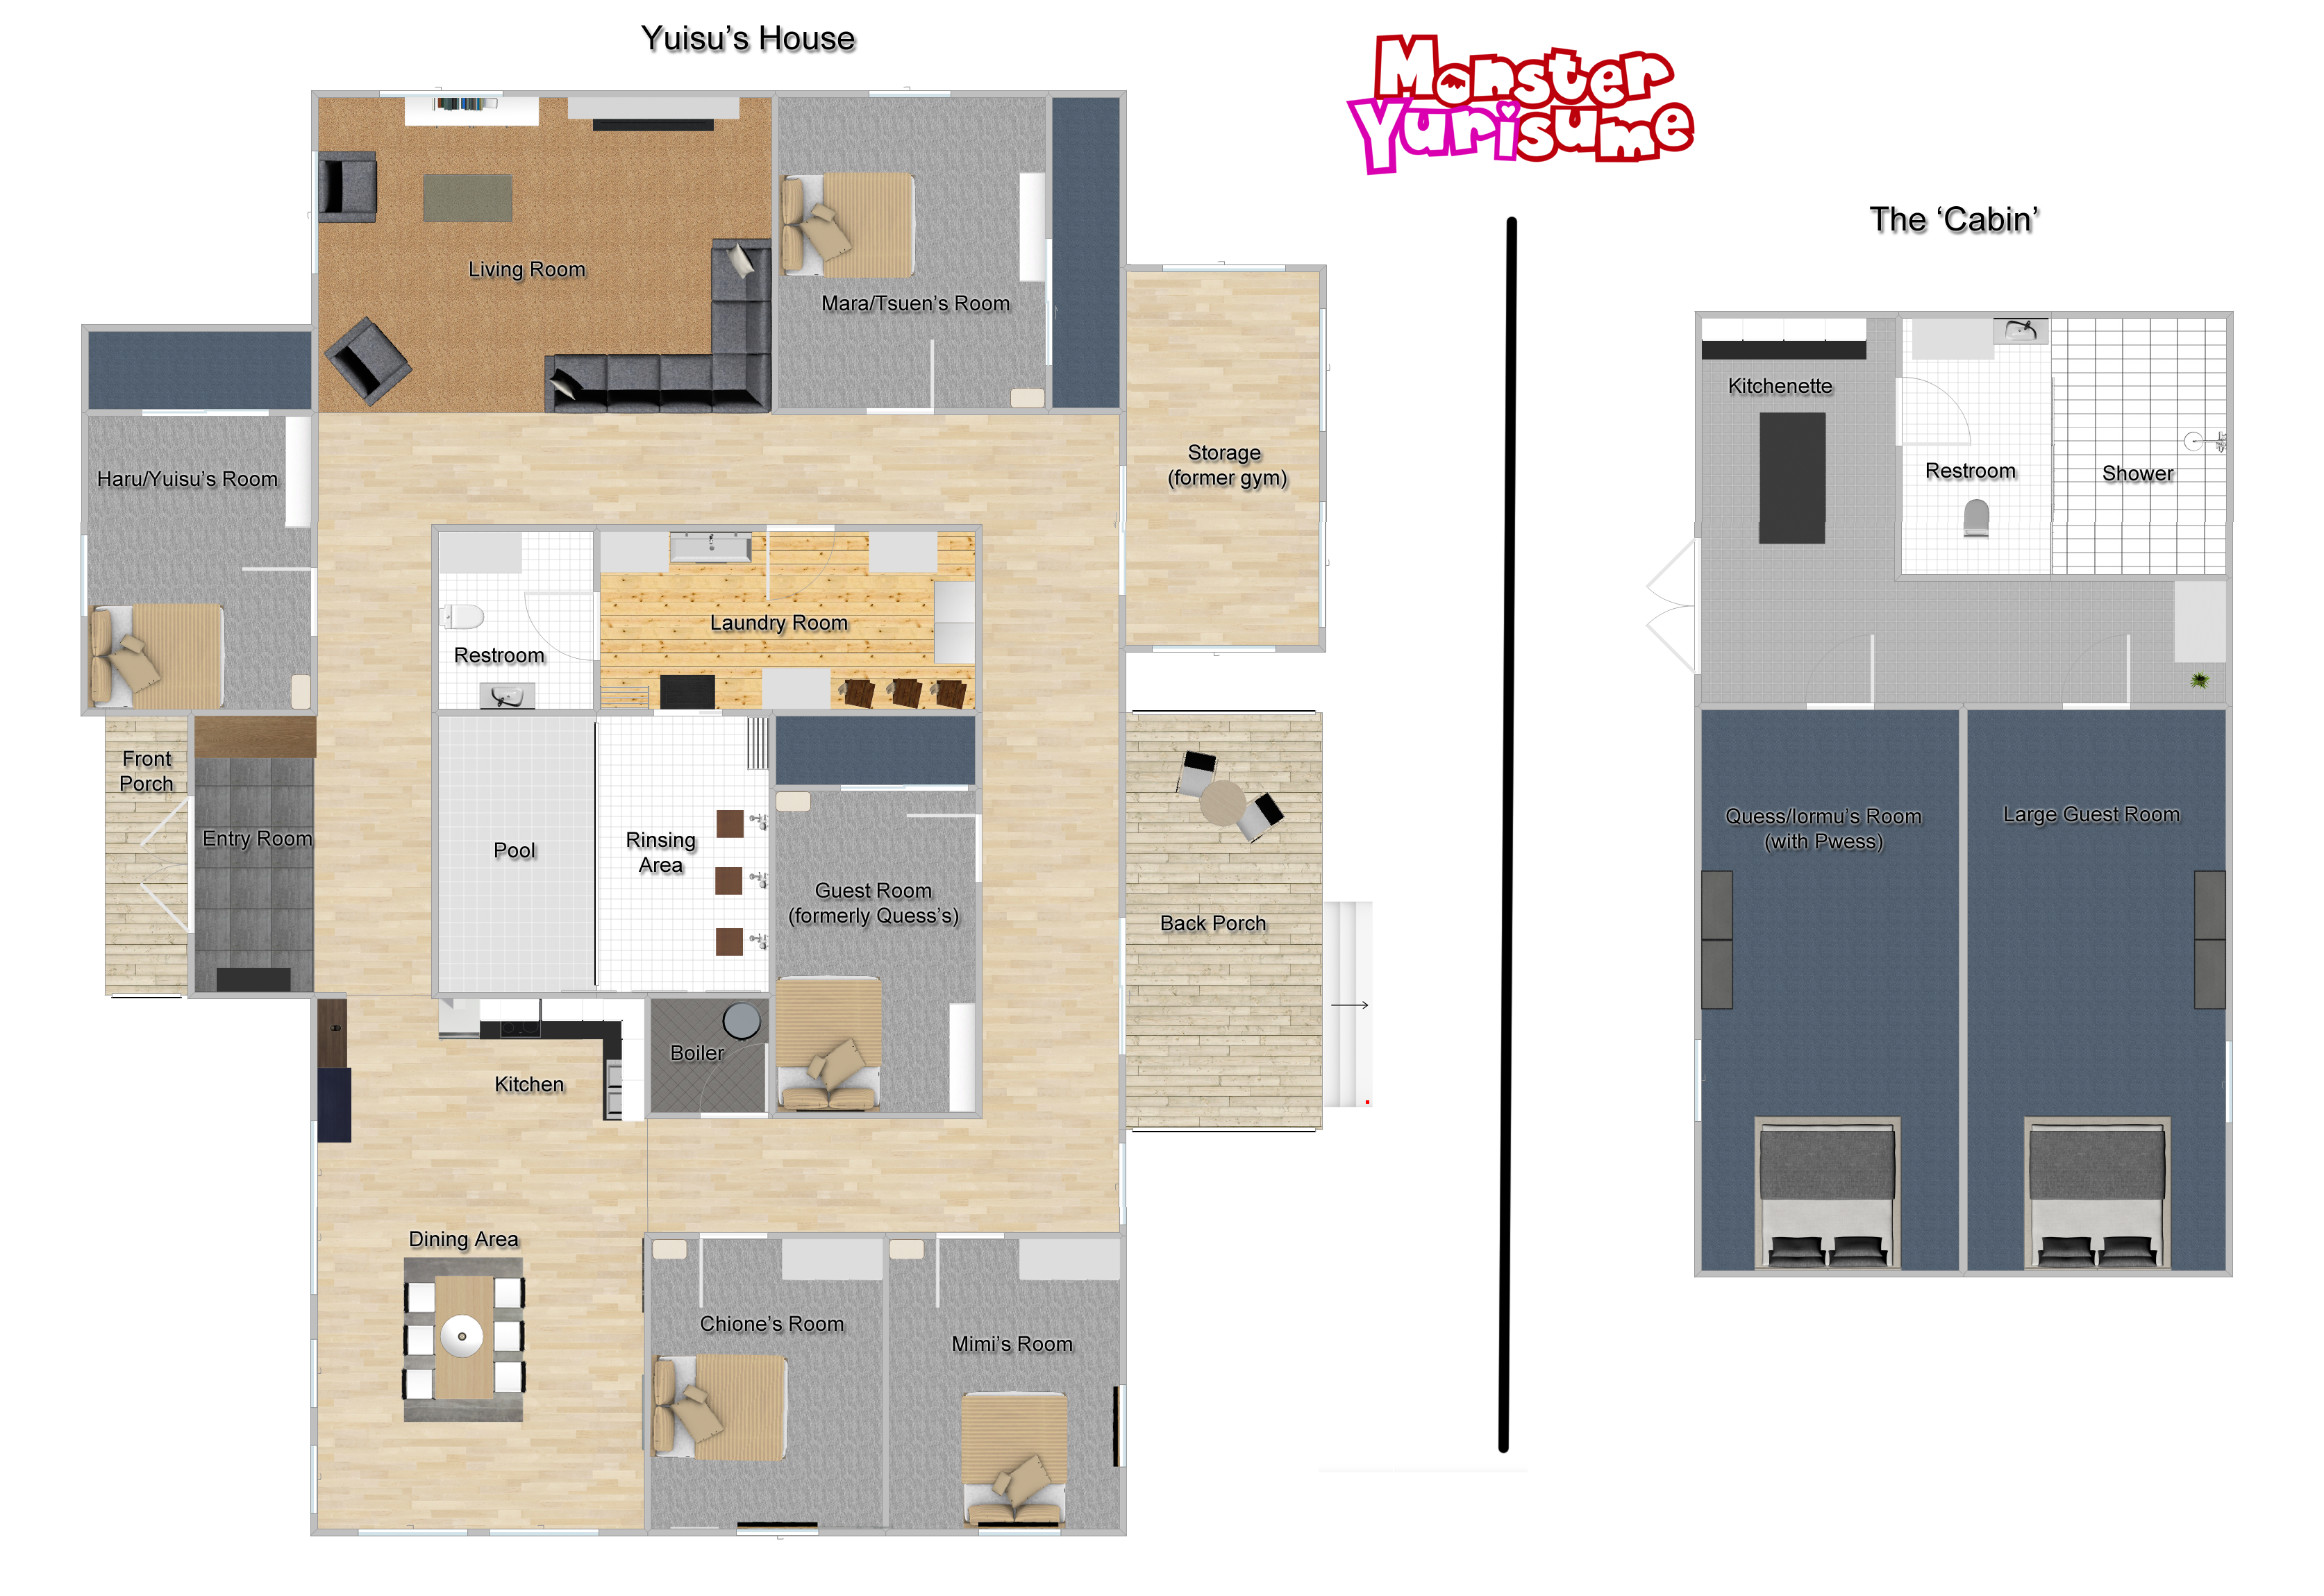 Yuisu 39 s house floor plan by natron77 on deviantart for Monster mansion mobile home floor plan